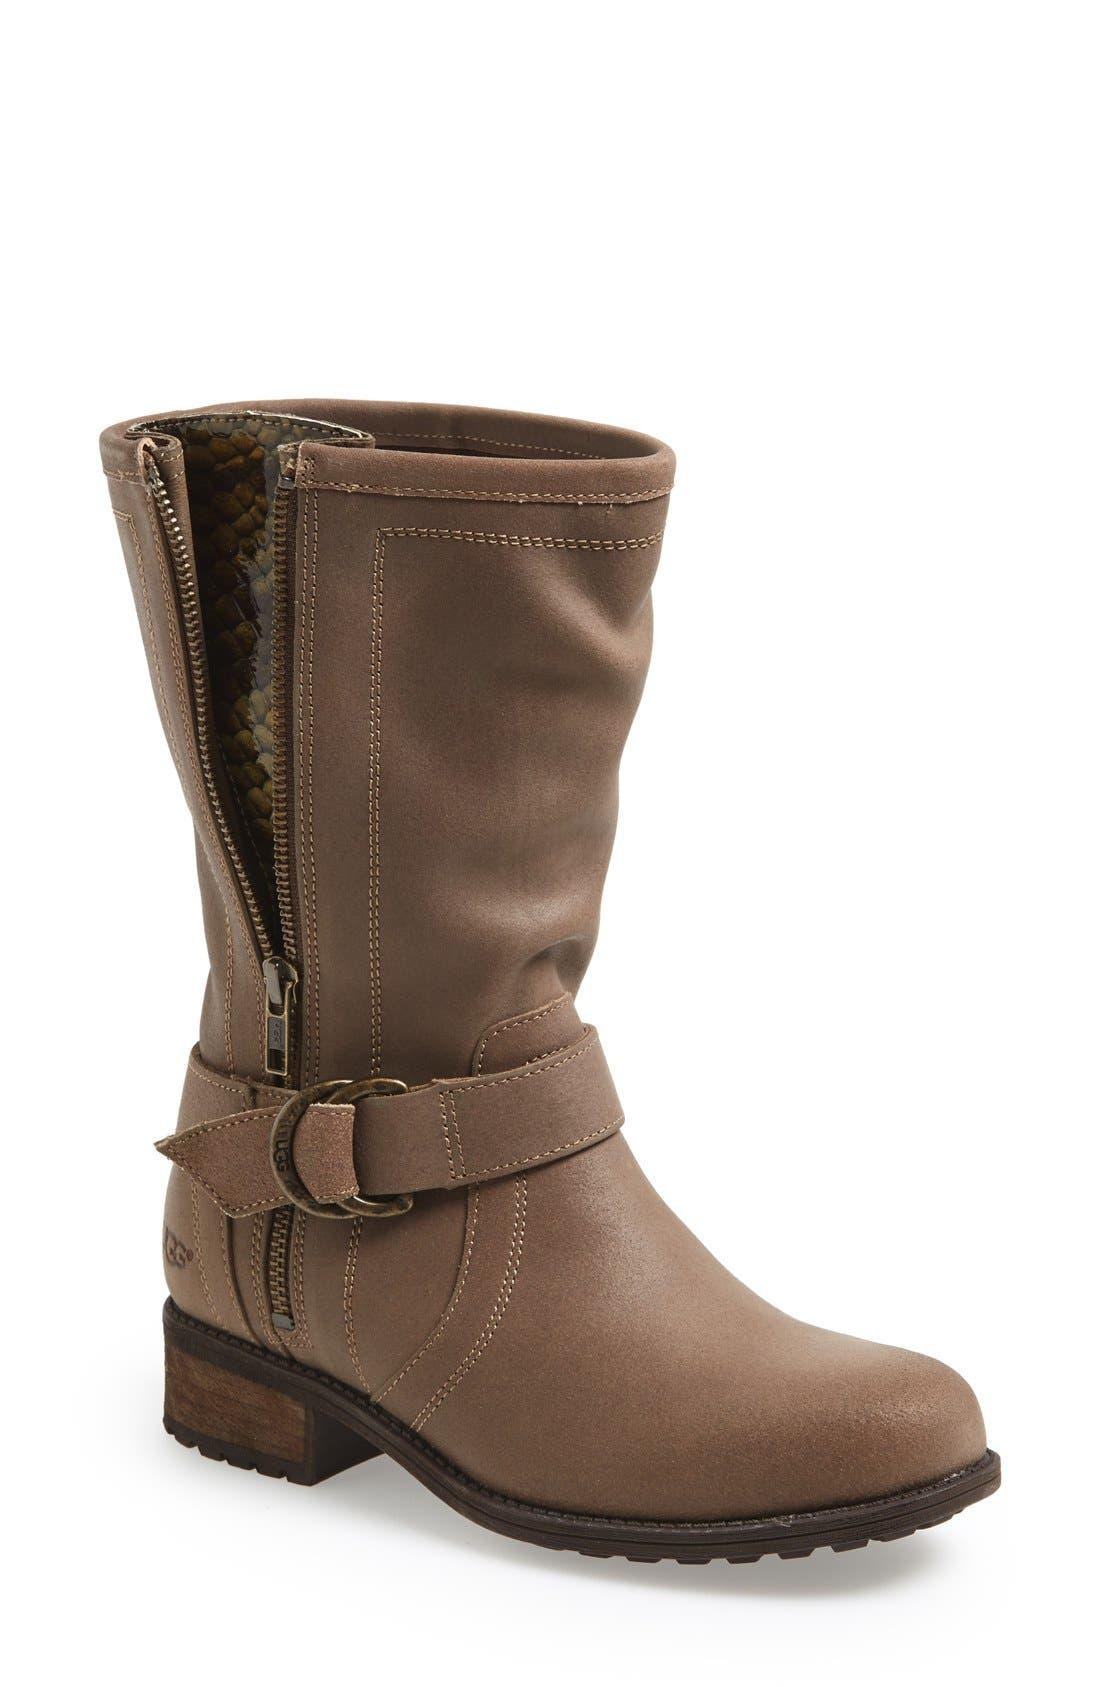 Main Image - UGG® Australia 'Silva' Zip Gusset Boot (Women)